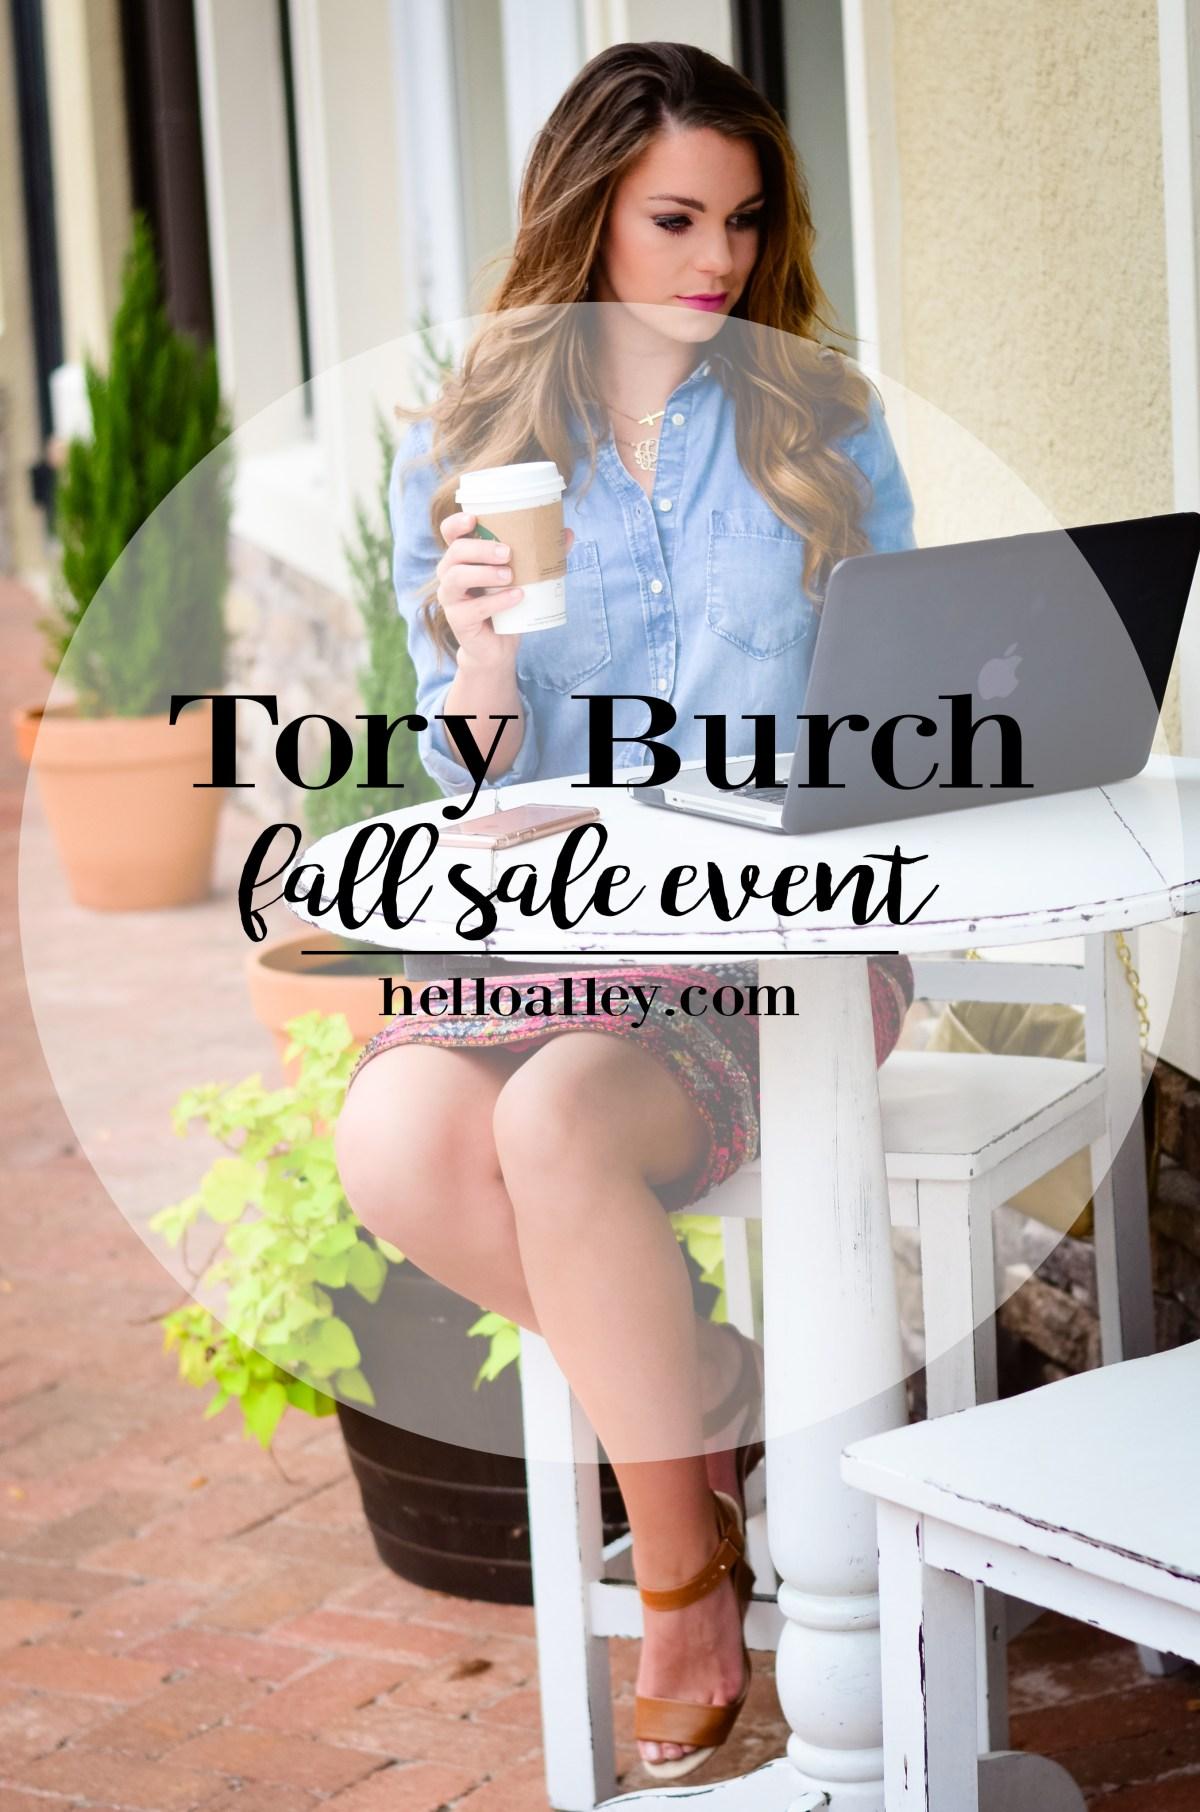 tory-burch-fall-sale-event